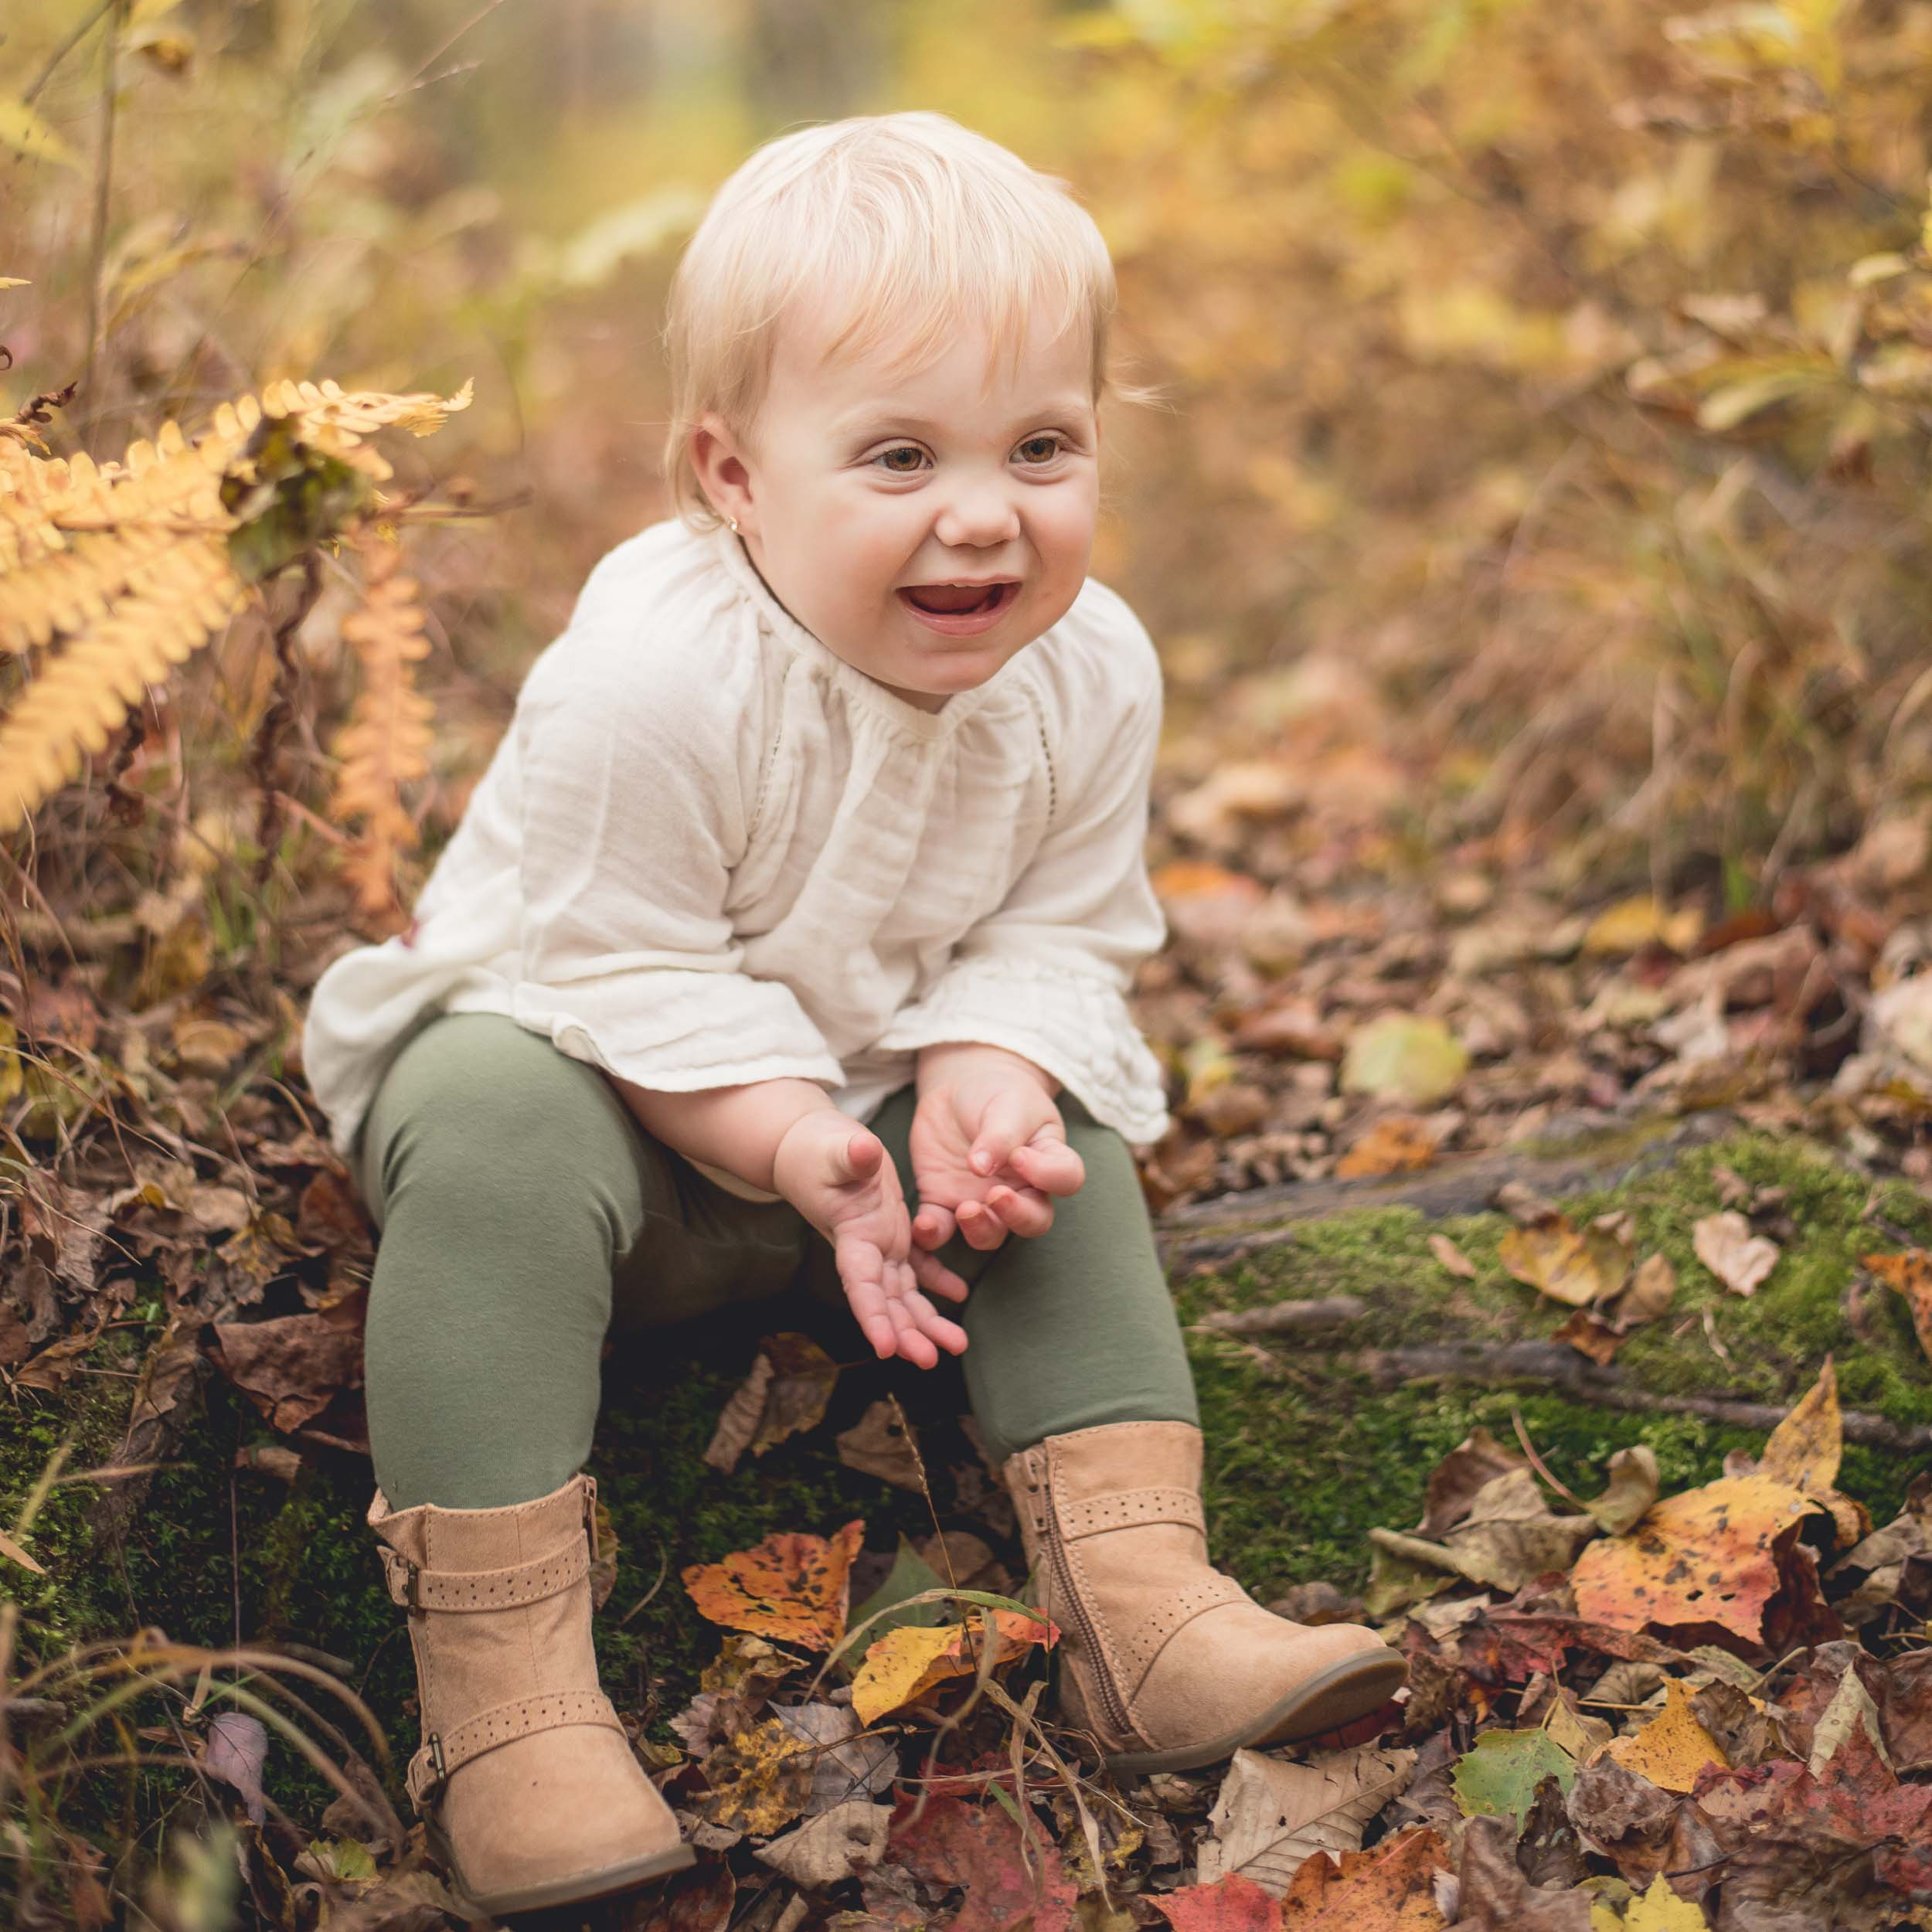 Ramsey_Child_Family_Photo_Session_Maryland_Crofton_Gambrills(4of12).jpg